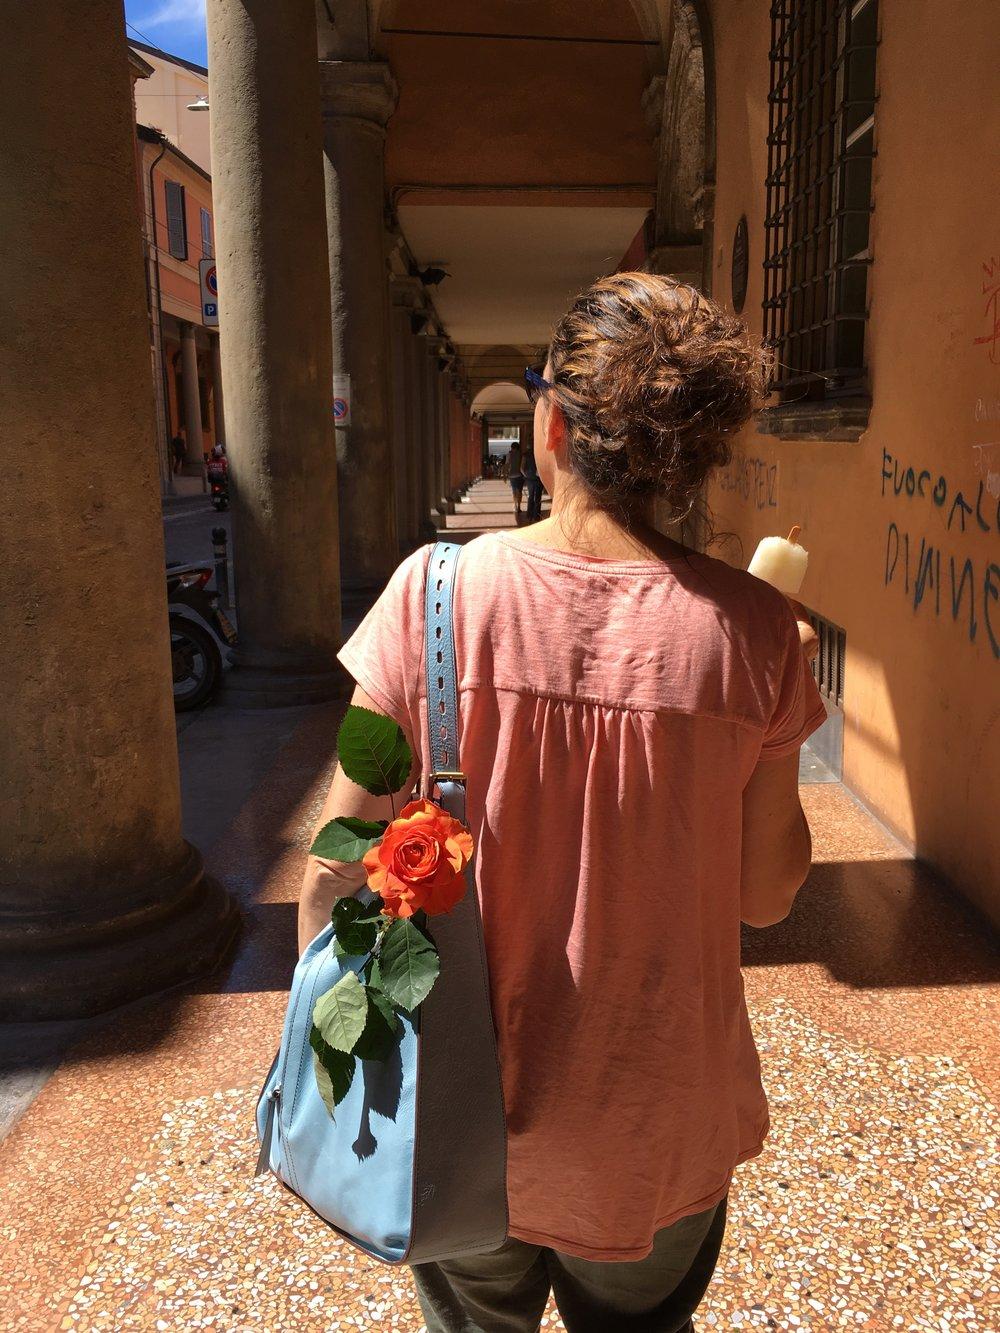 Bologna Rose, in Bologna Italy